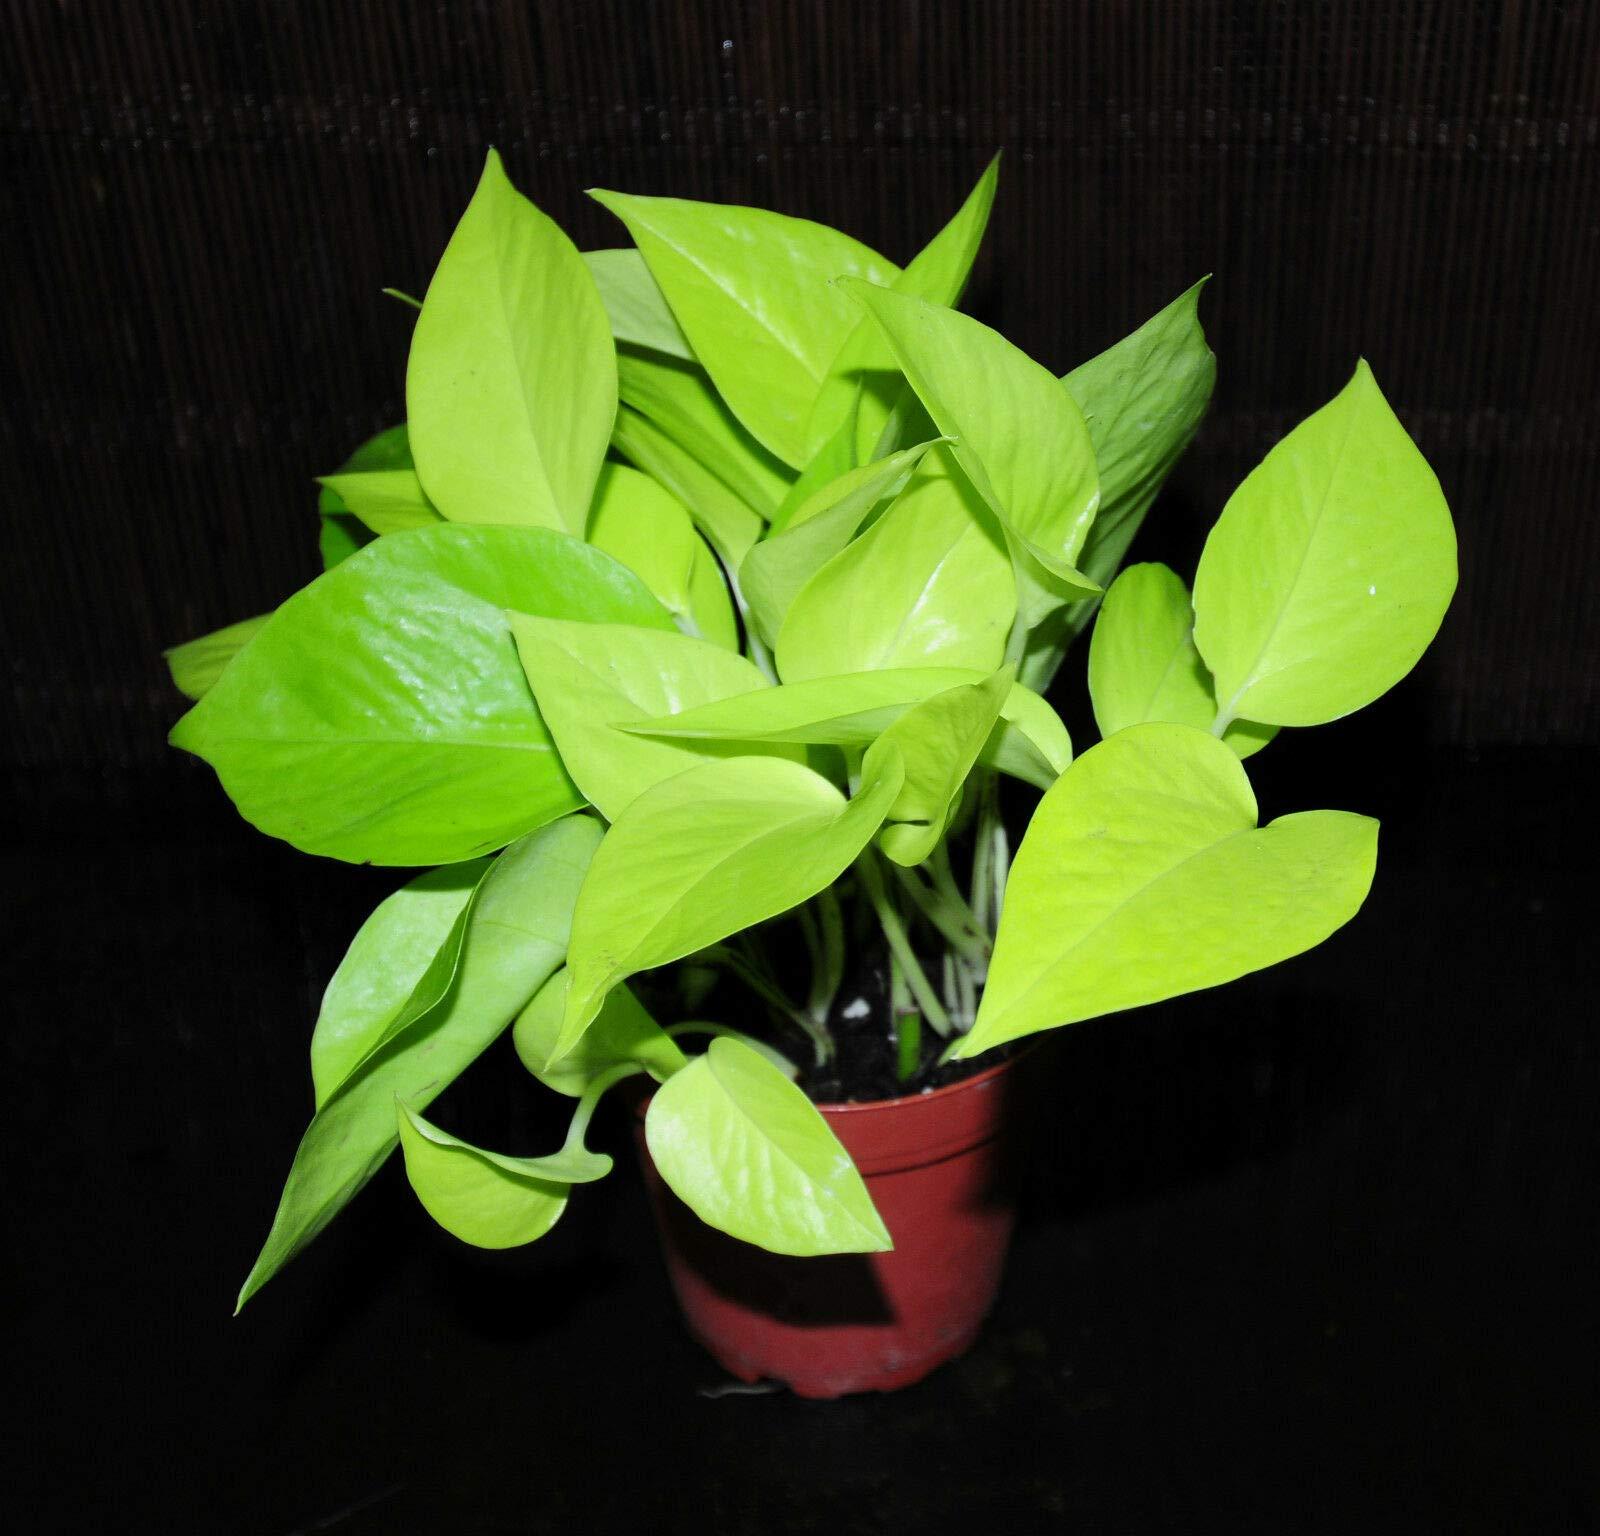 New Item~Neon Pothos 4'' Pot Epipremnum aureum Neon Beautiful Chartreuse Leaves (Premium Quality) by AY-Premium